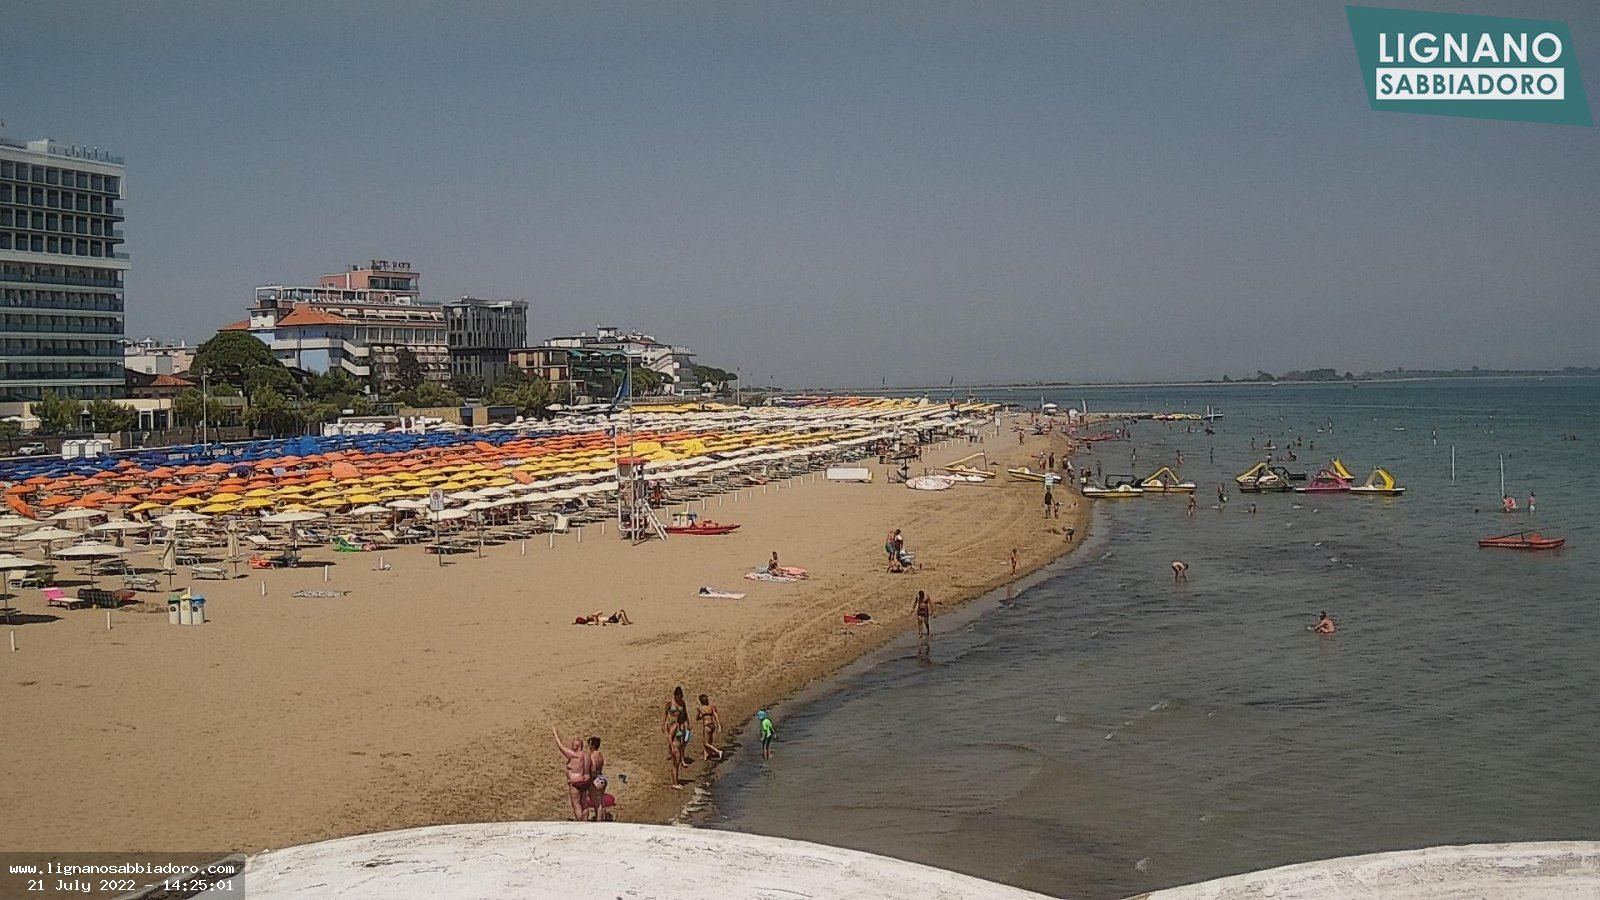 Webcam in Lignano Sabbiadoro, panoramic view onto the VIP gazebos on the beach